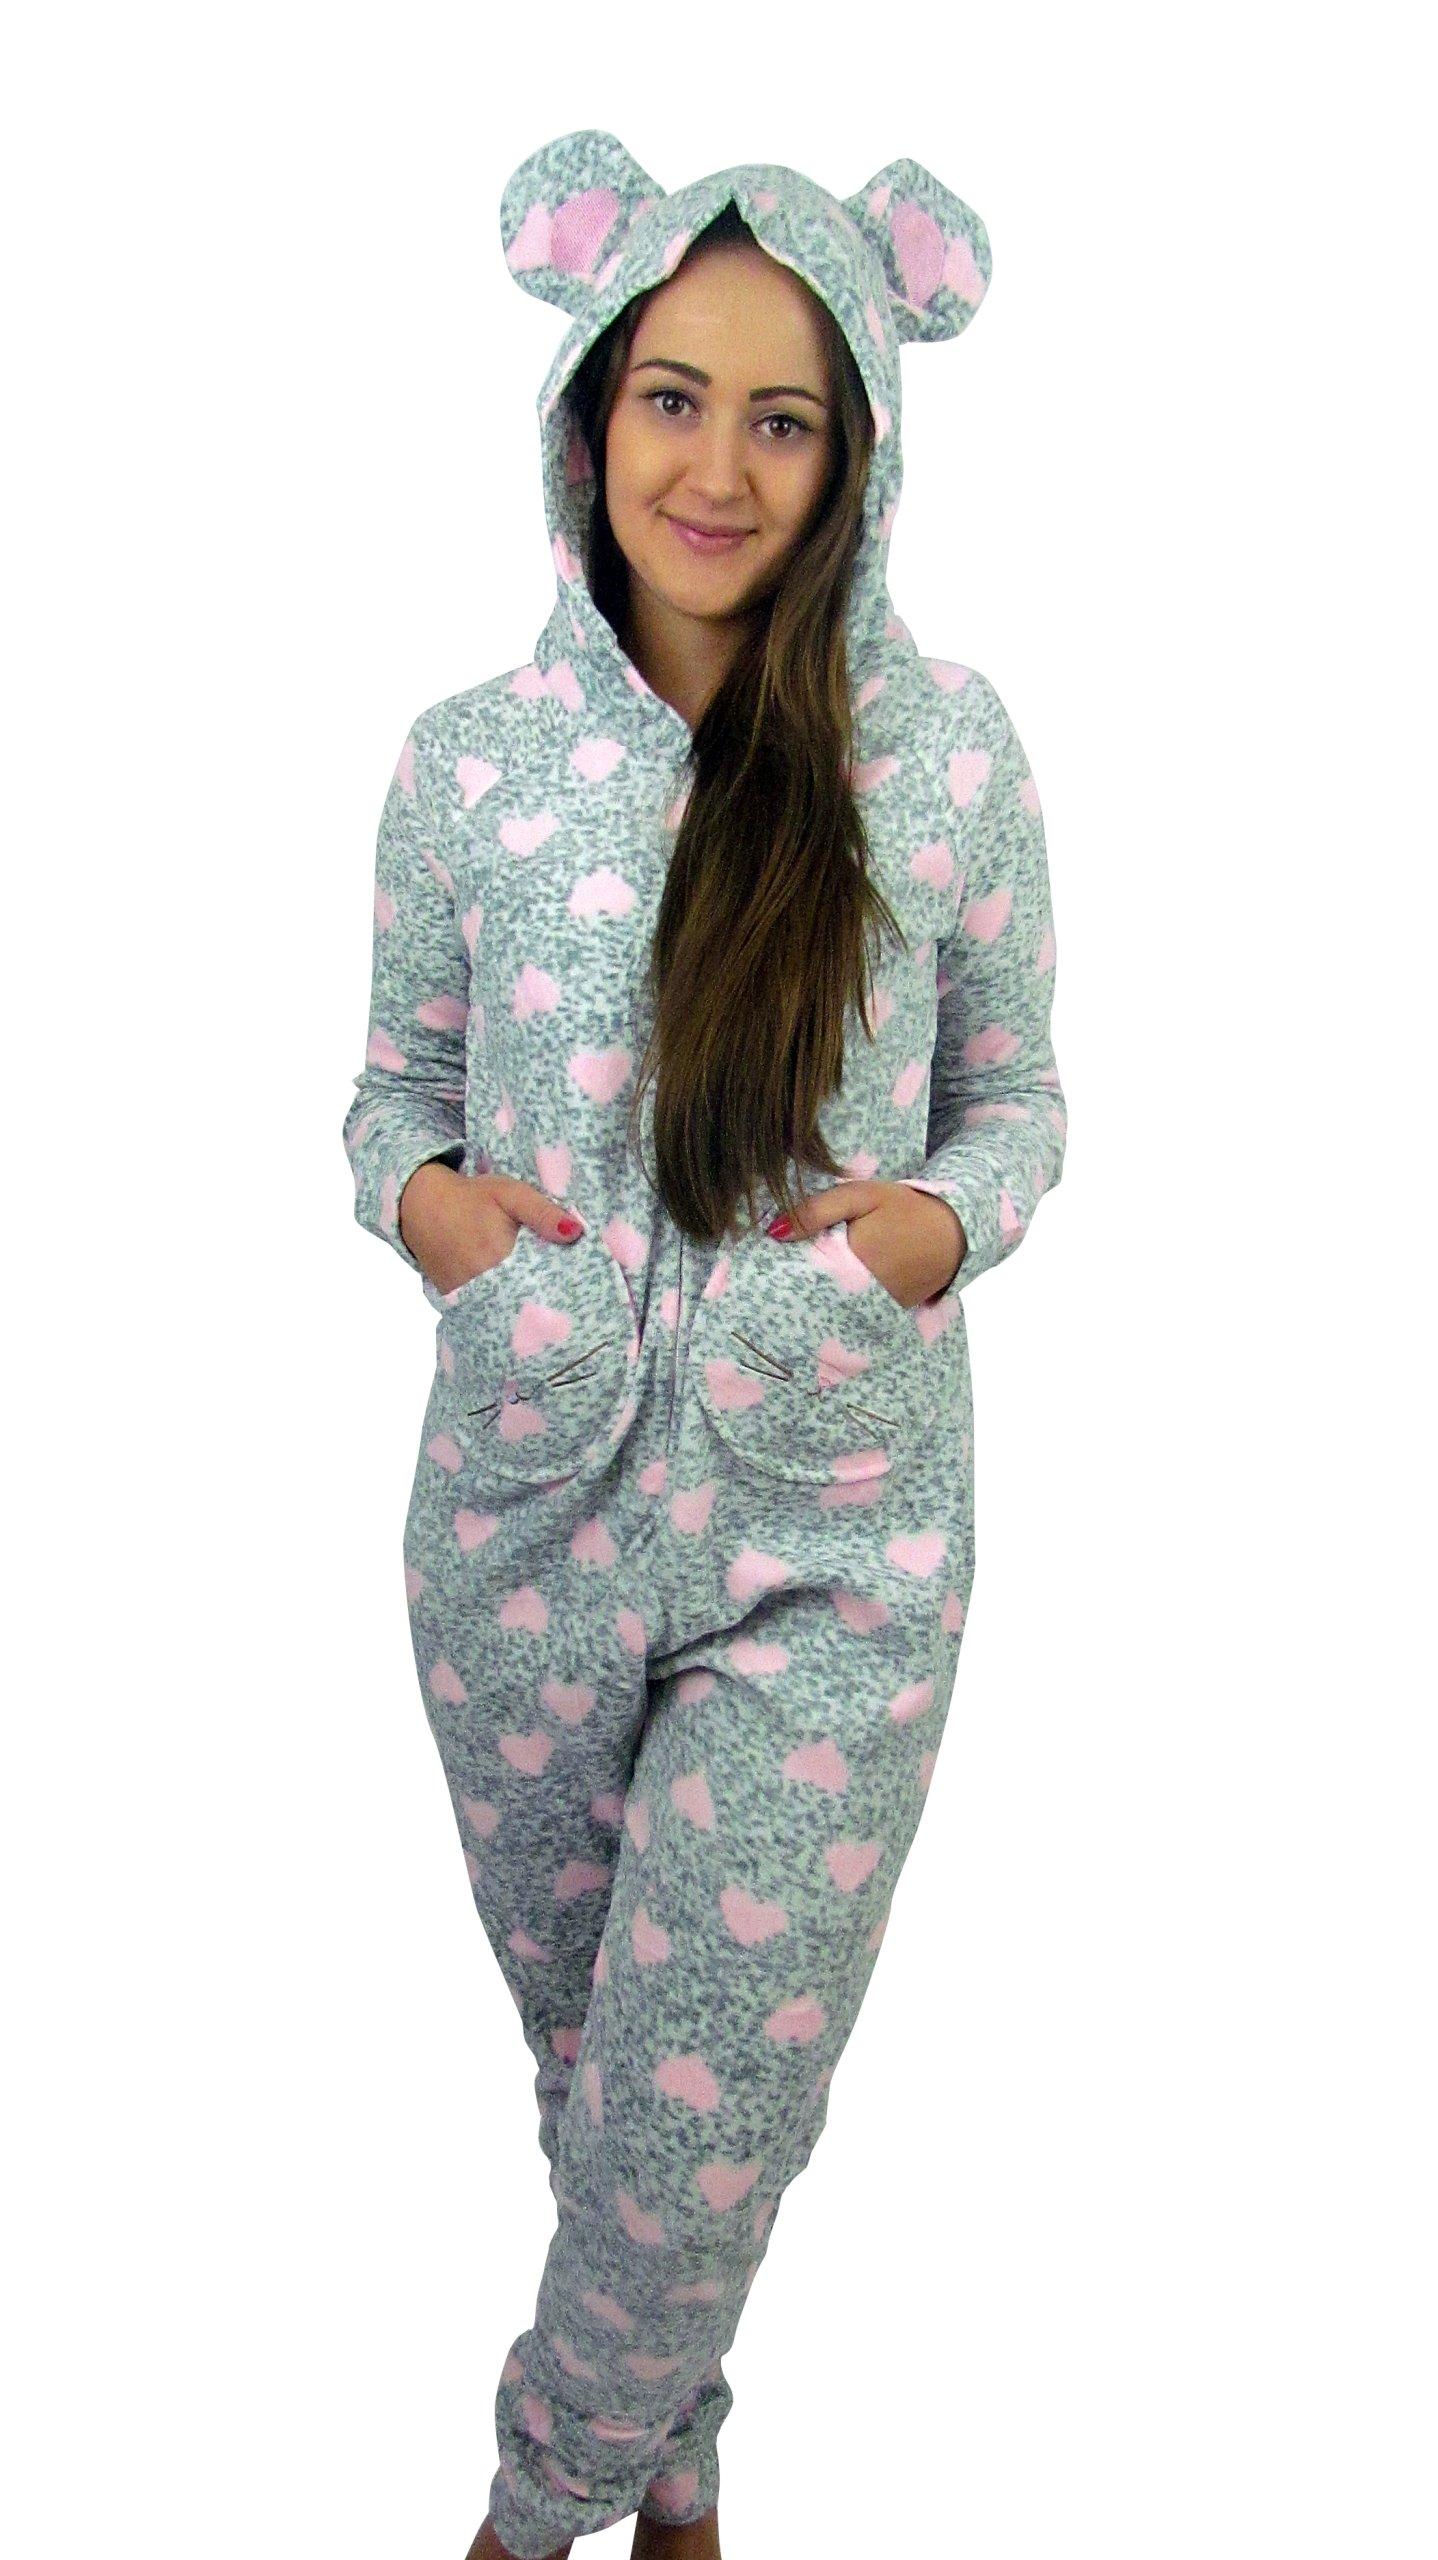 528719b4eacf89 ONESIE-piżama polar KOMBINEZON pajac- miś M-L - 6973161741 ...